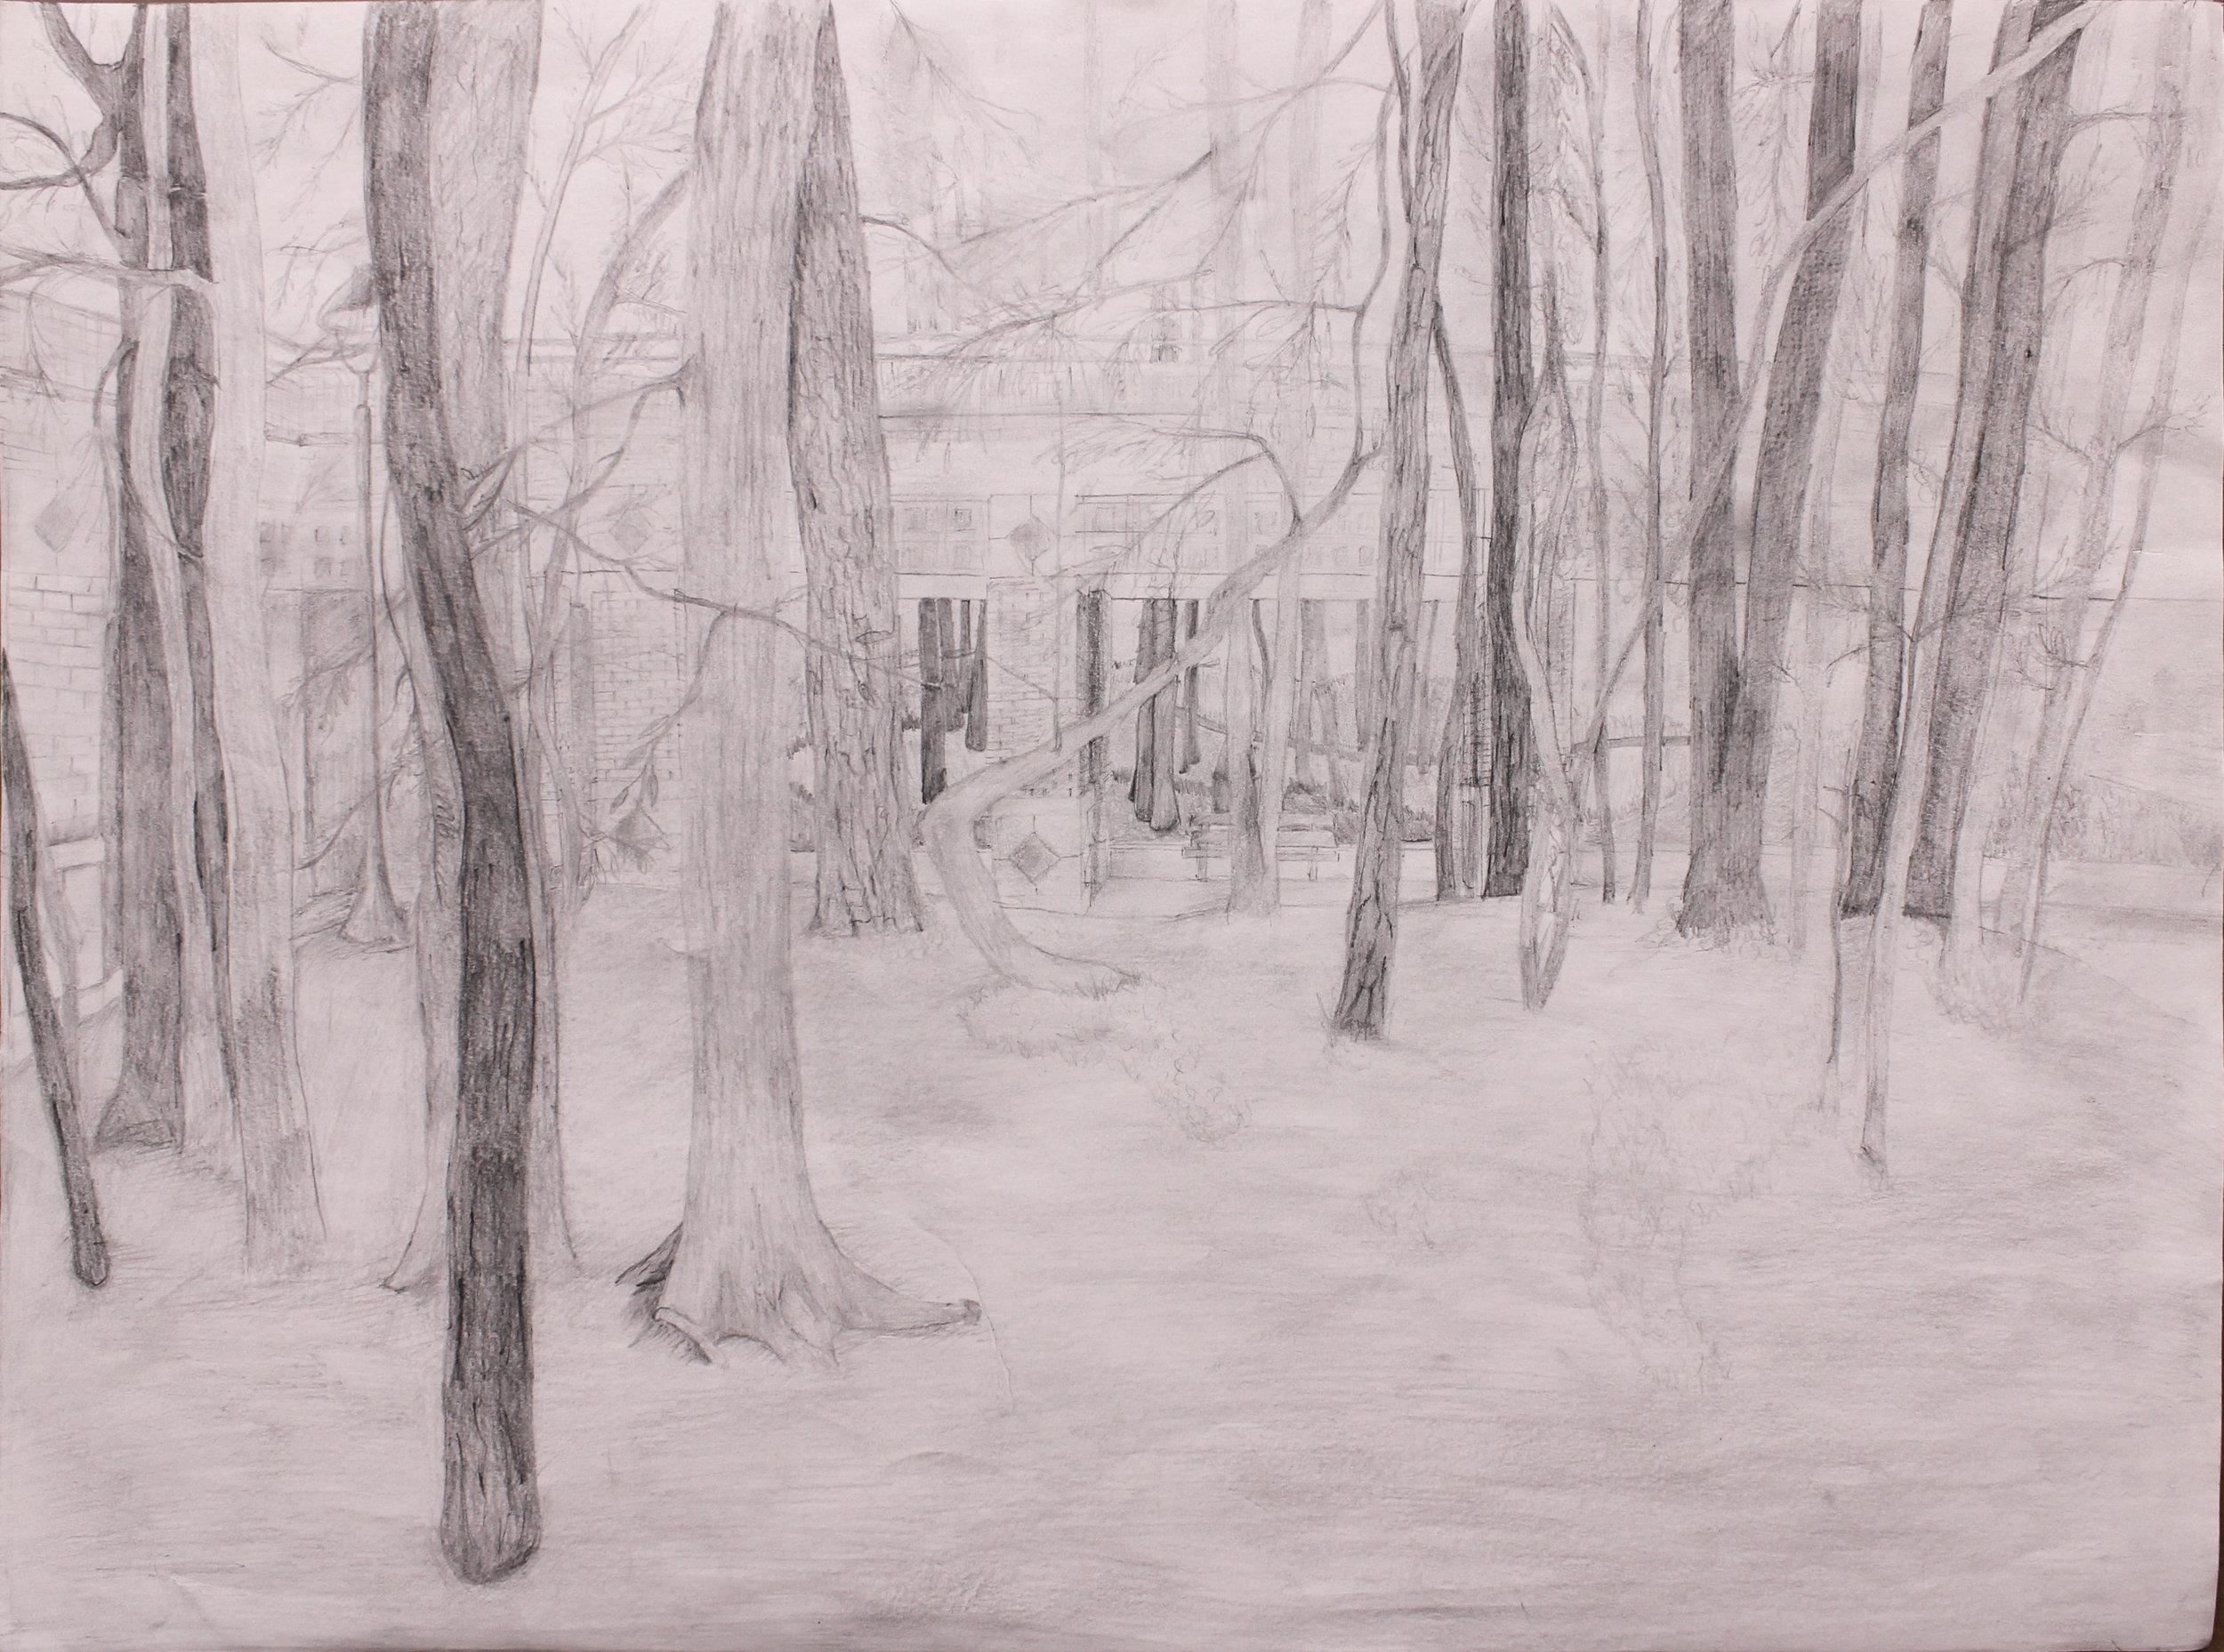 Drawing 1 - Landscape